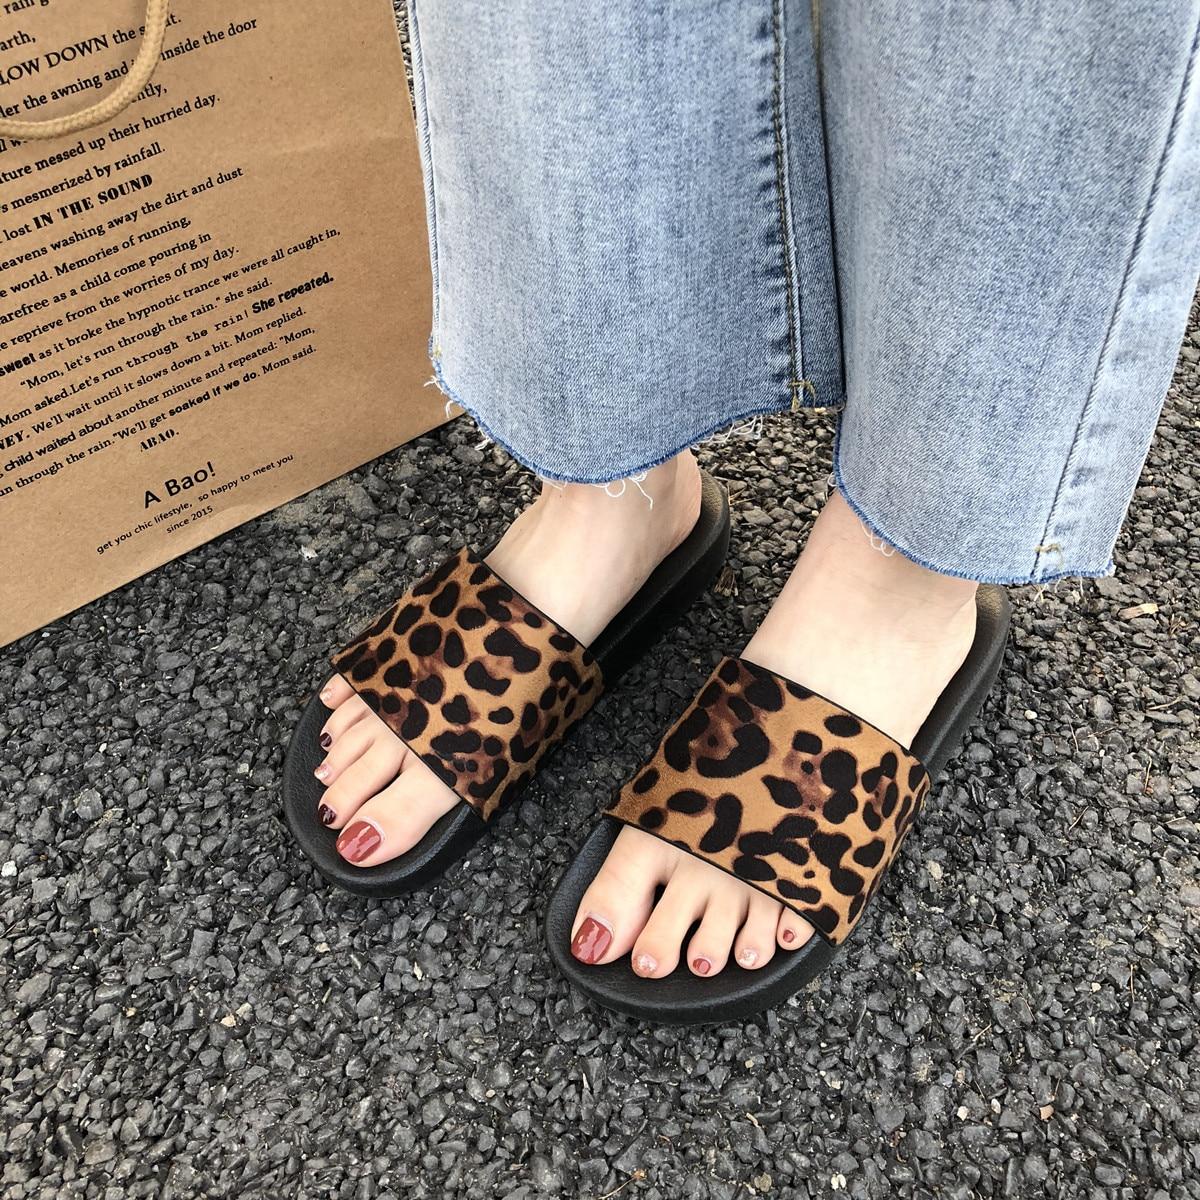 Summer Slippers Women Slides Leopard Indoor & Outdoor Slippers Platform Sandals Shoes Women Slip On Flip Flops Zapatillas Mujer 1